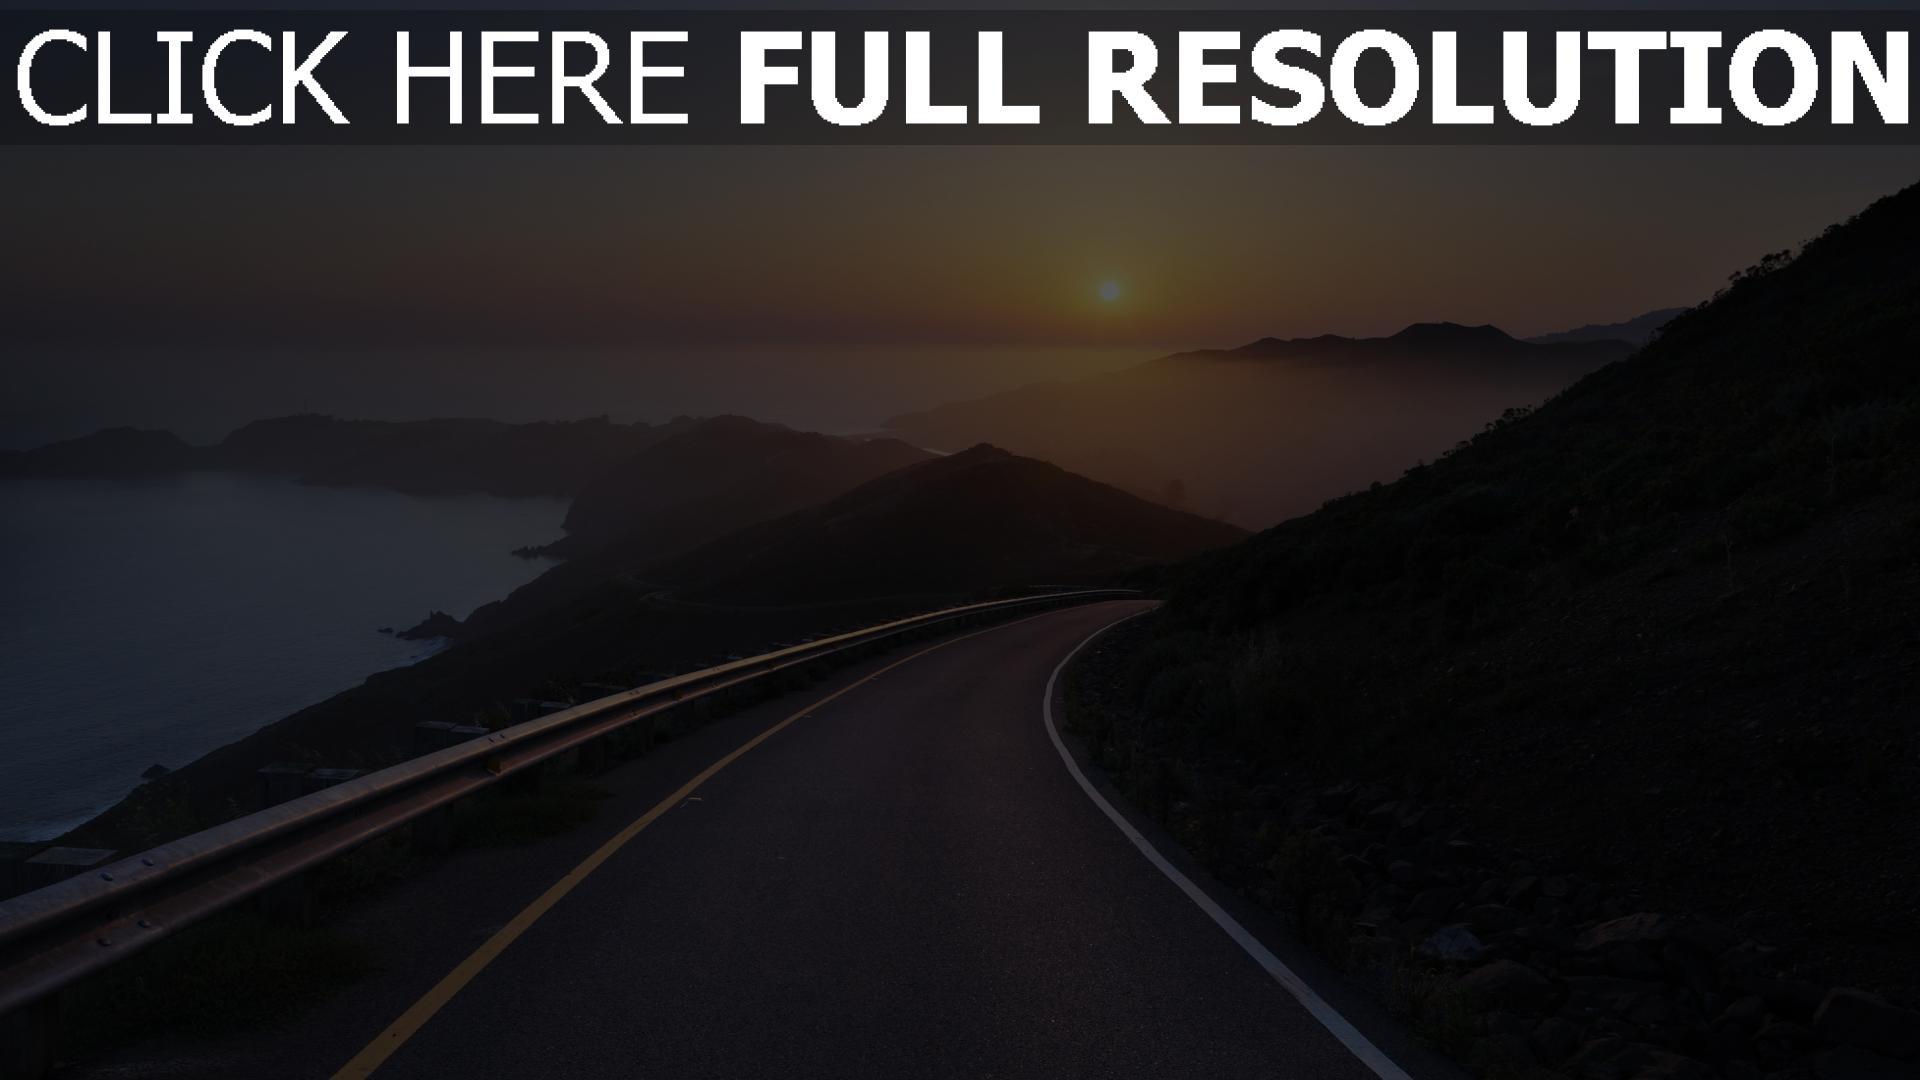 hd hintergrundbilder sonnenuntergang sonne straße berge bucht nebel 1920x1080